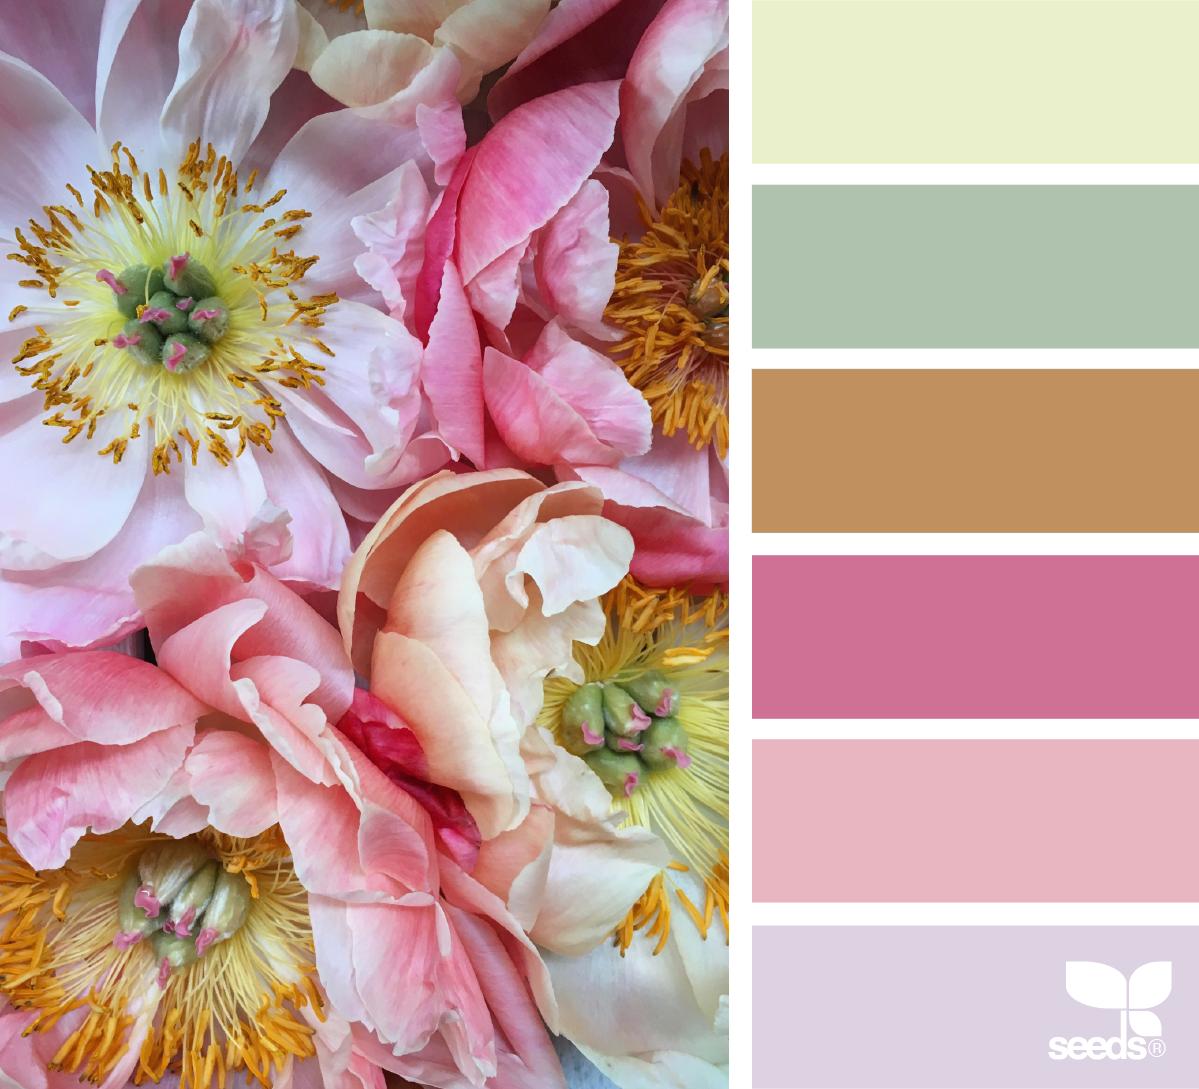 Charmed Flora | Flora, Design seeds and Inspiration